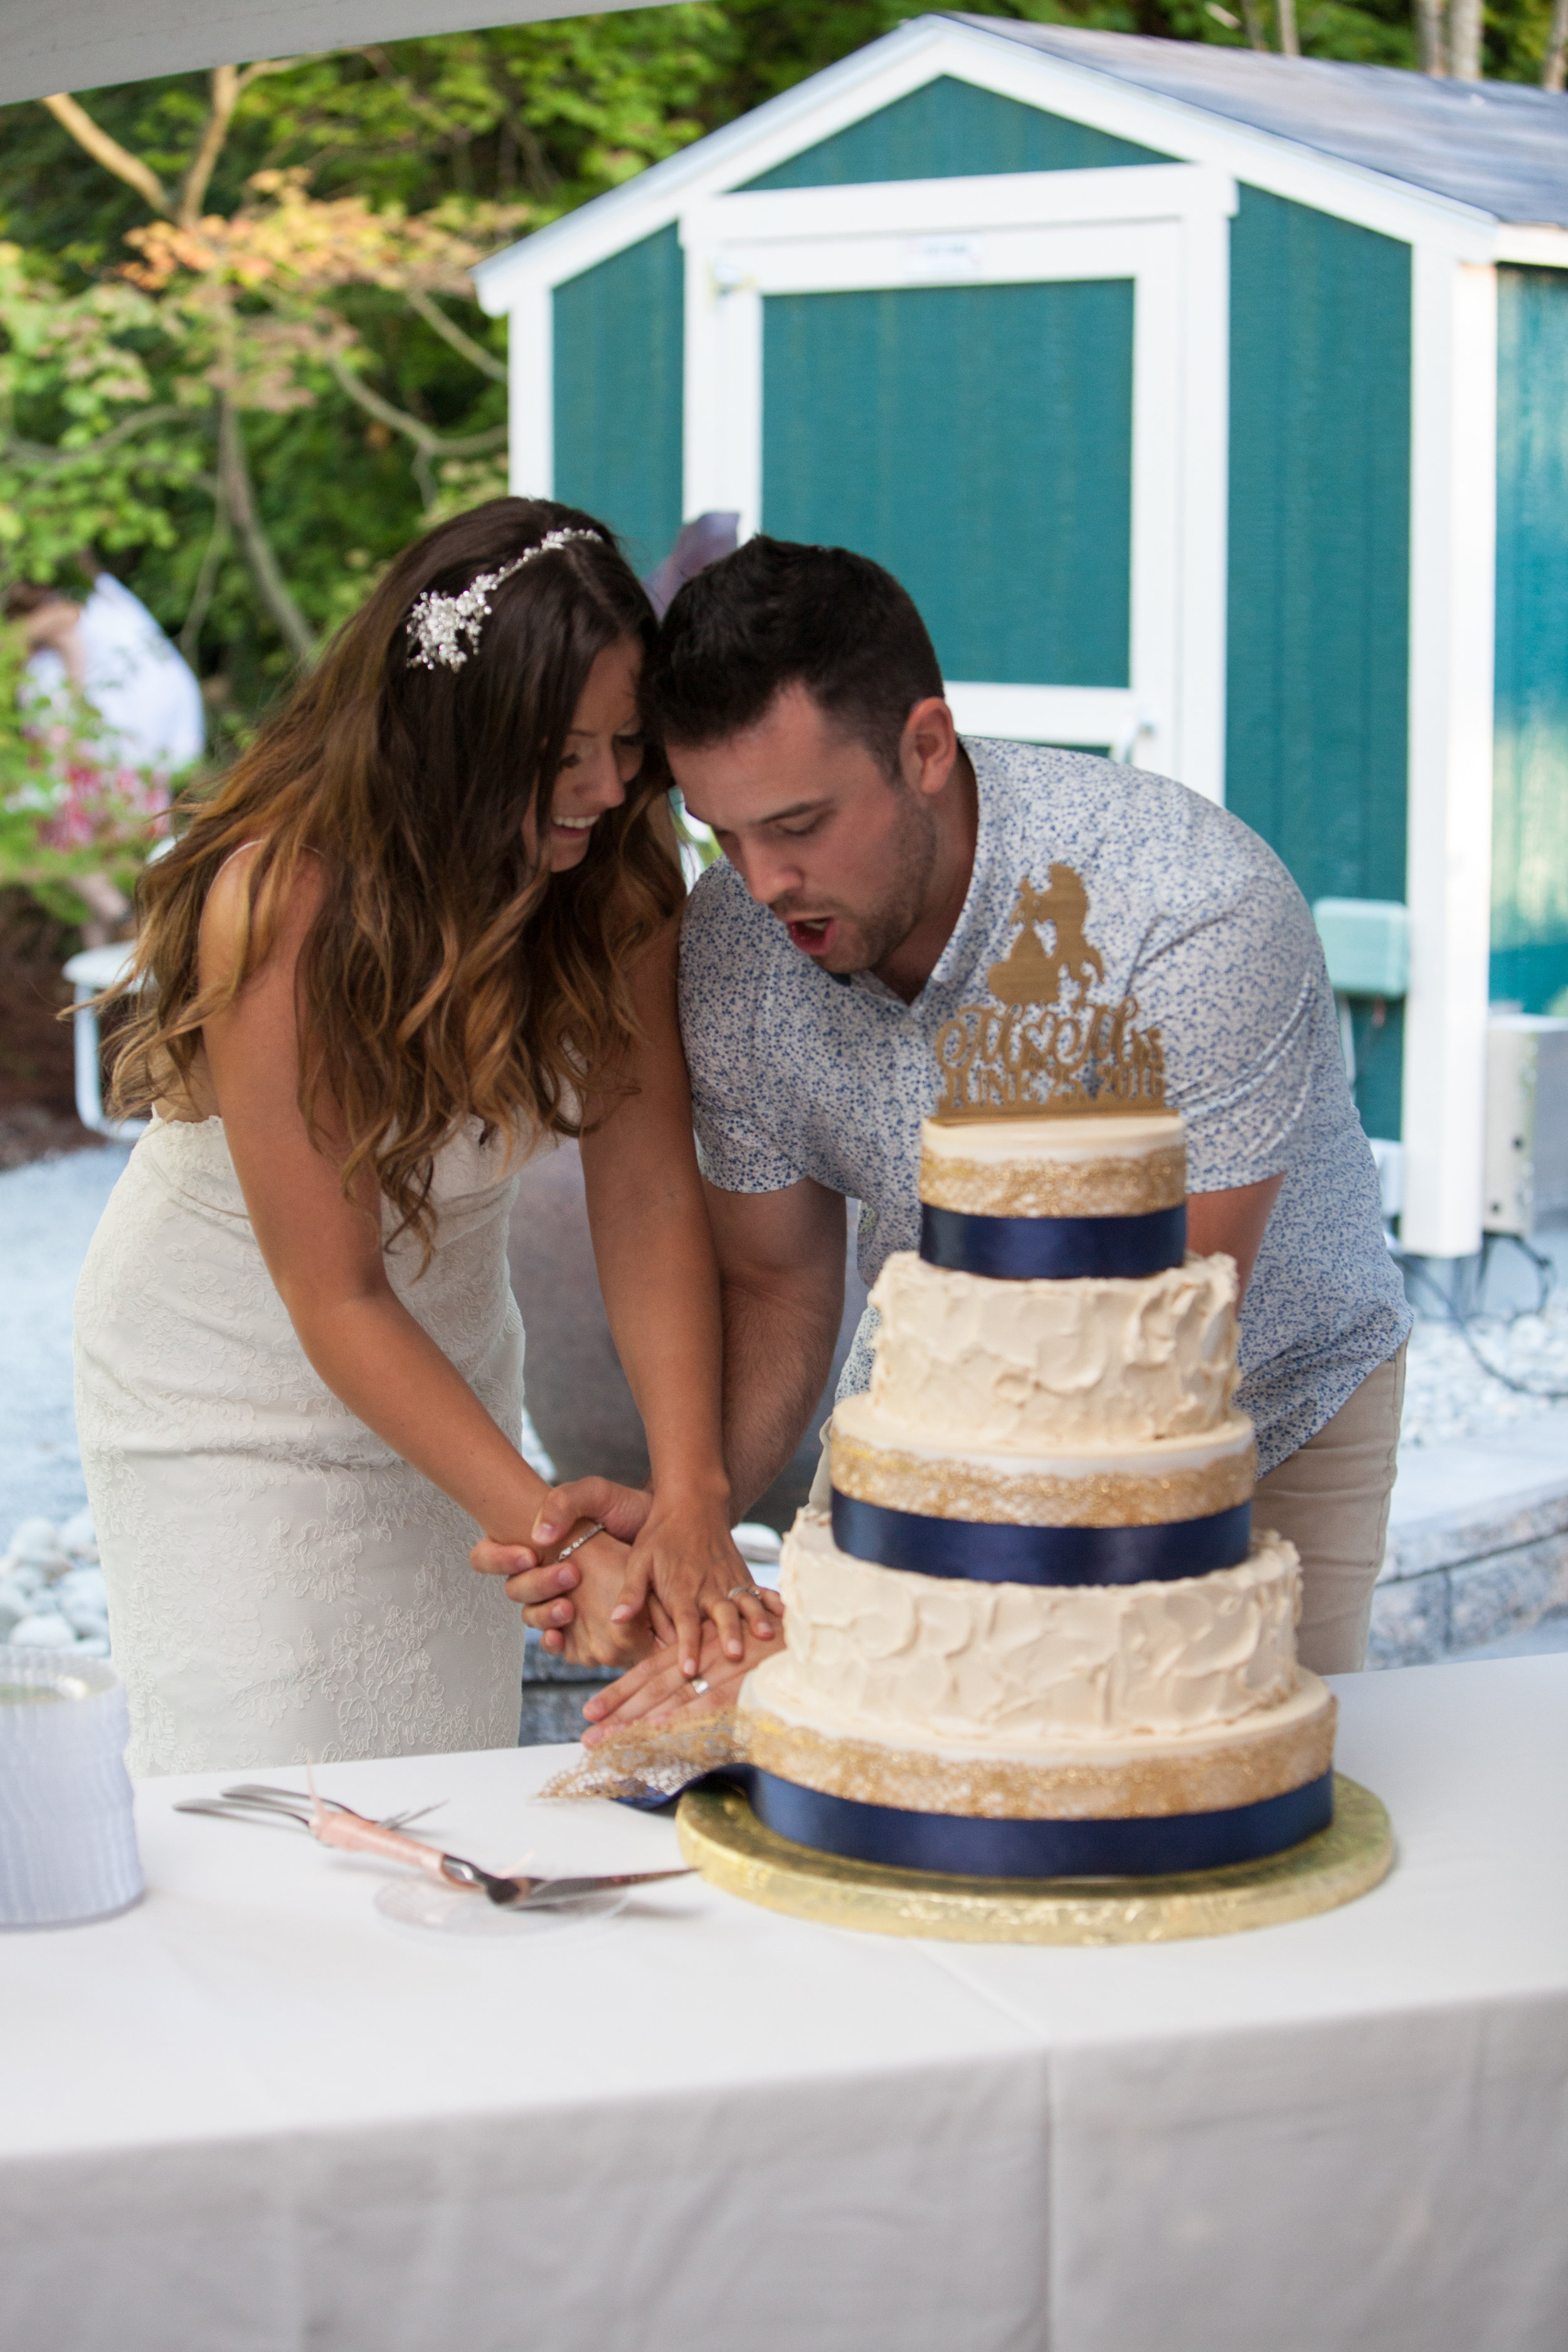 sandstrom_wedding_707.jpg